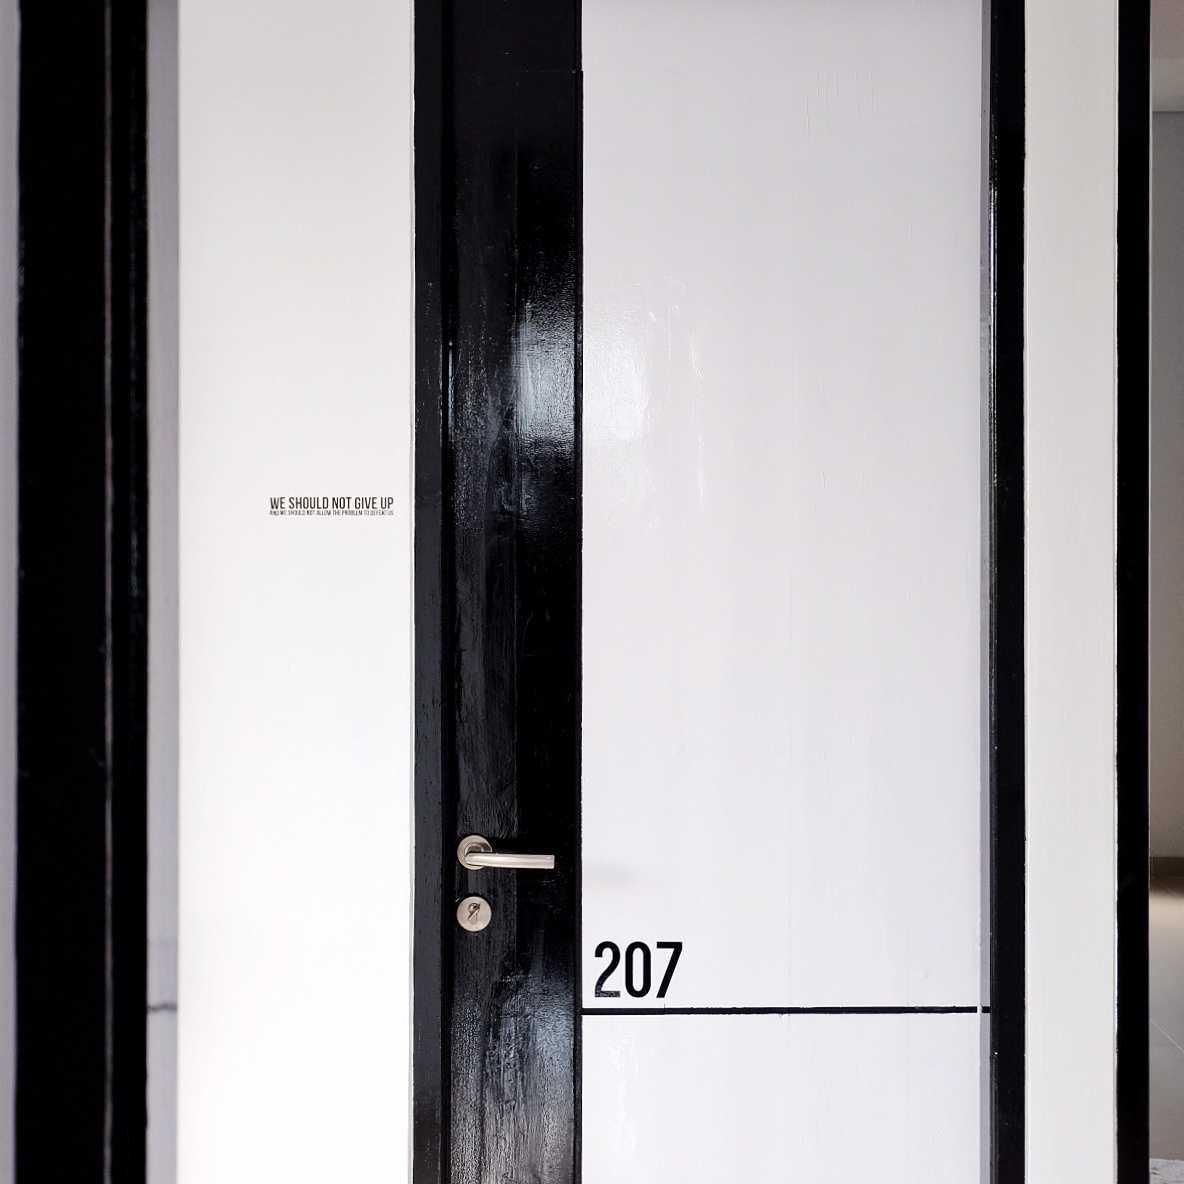 Xoa Design Ampi Boarding House Pekanbaru, Kota Pekanbaru, Riau, Indonesia Pekanbaru, Kota Pekanbaru, Riau, Indonesia Rooms Contemporary,modern,kontemporer 39591